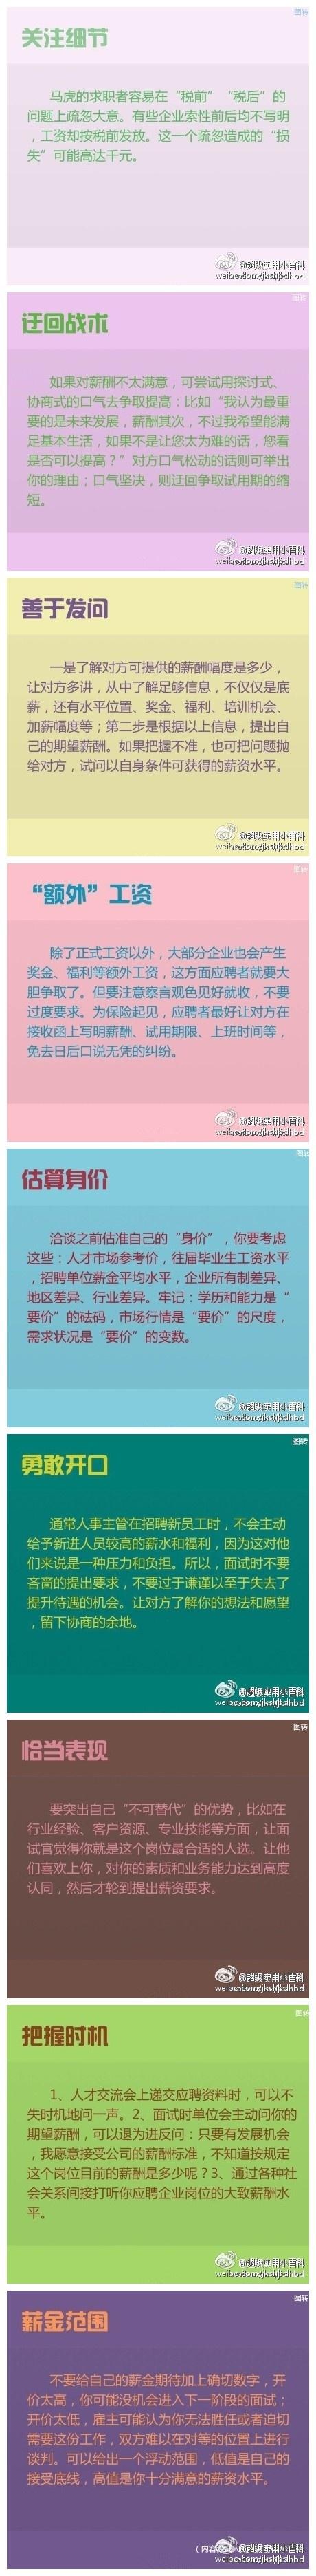 http://static.oschina.net/uploads/space/2015/0512/125639_YfUO_1037462.jpg